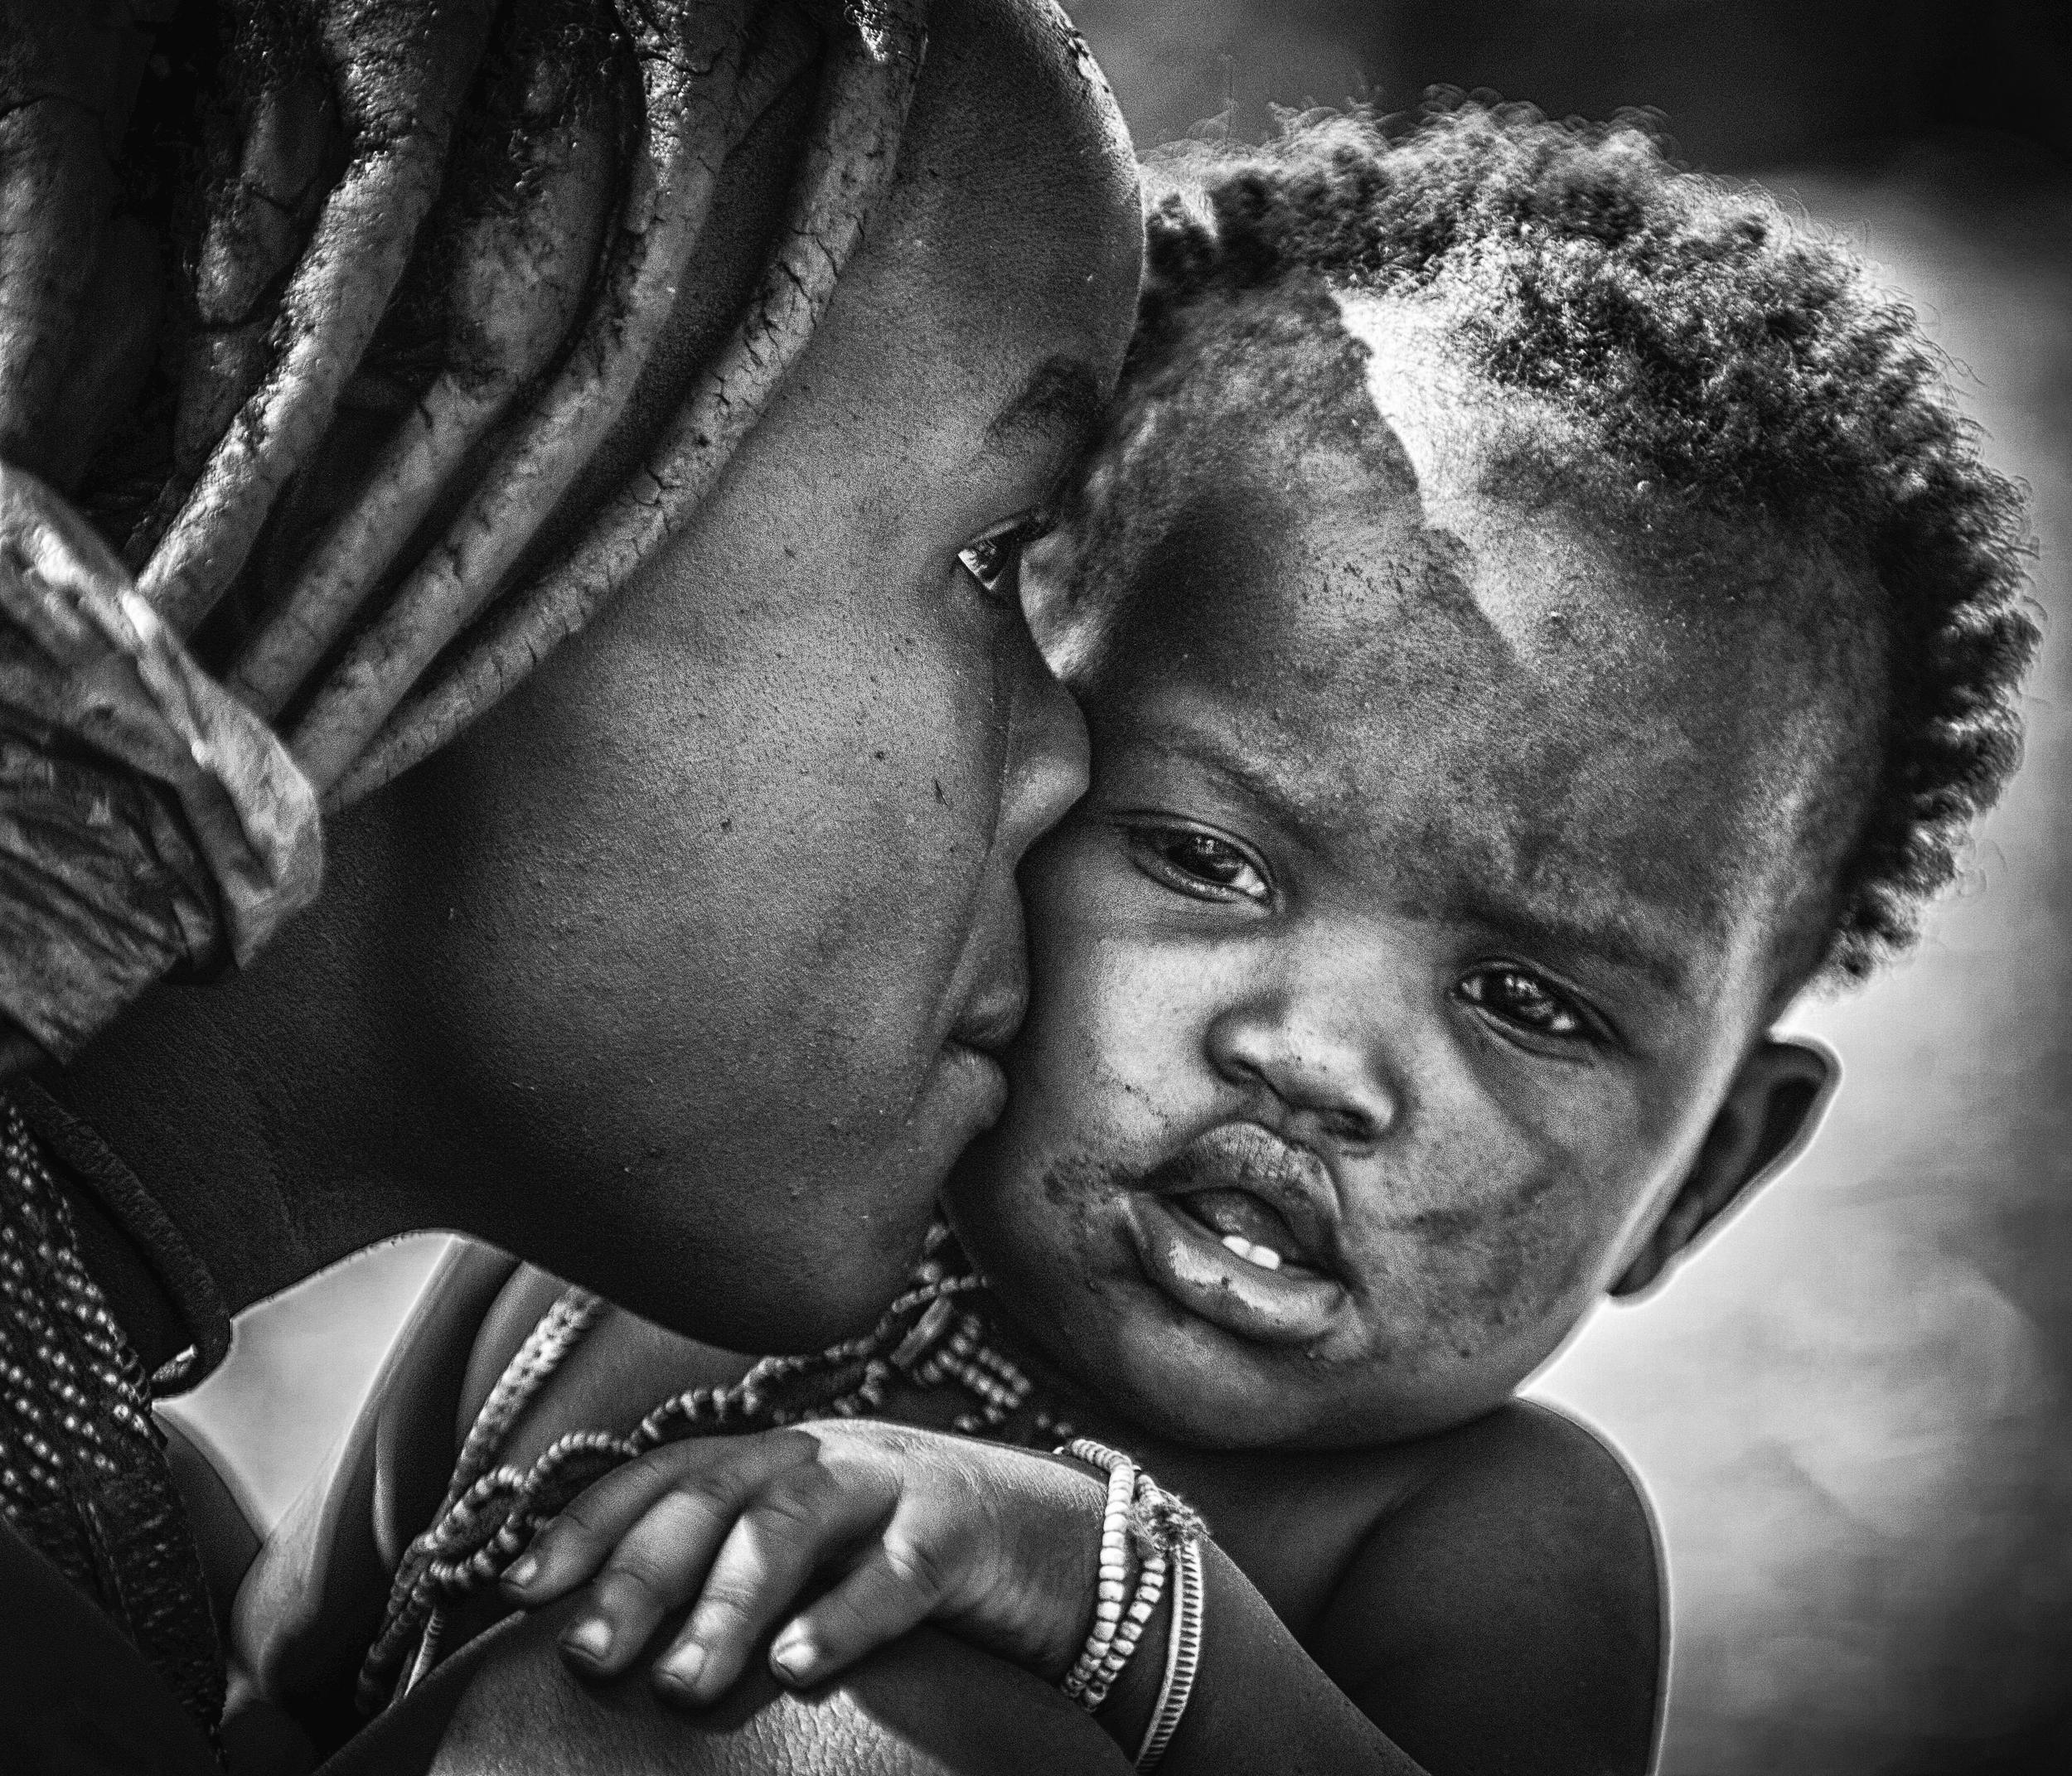 kiss from beautiful himba mom